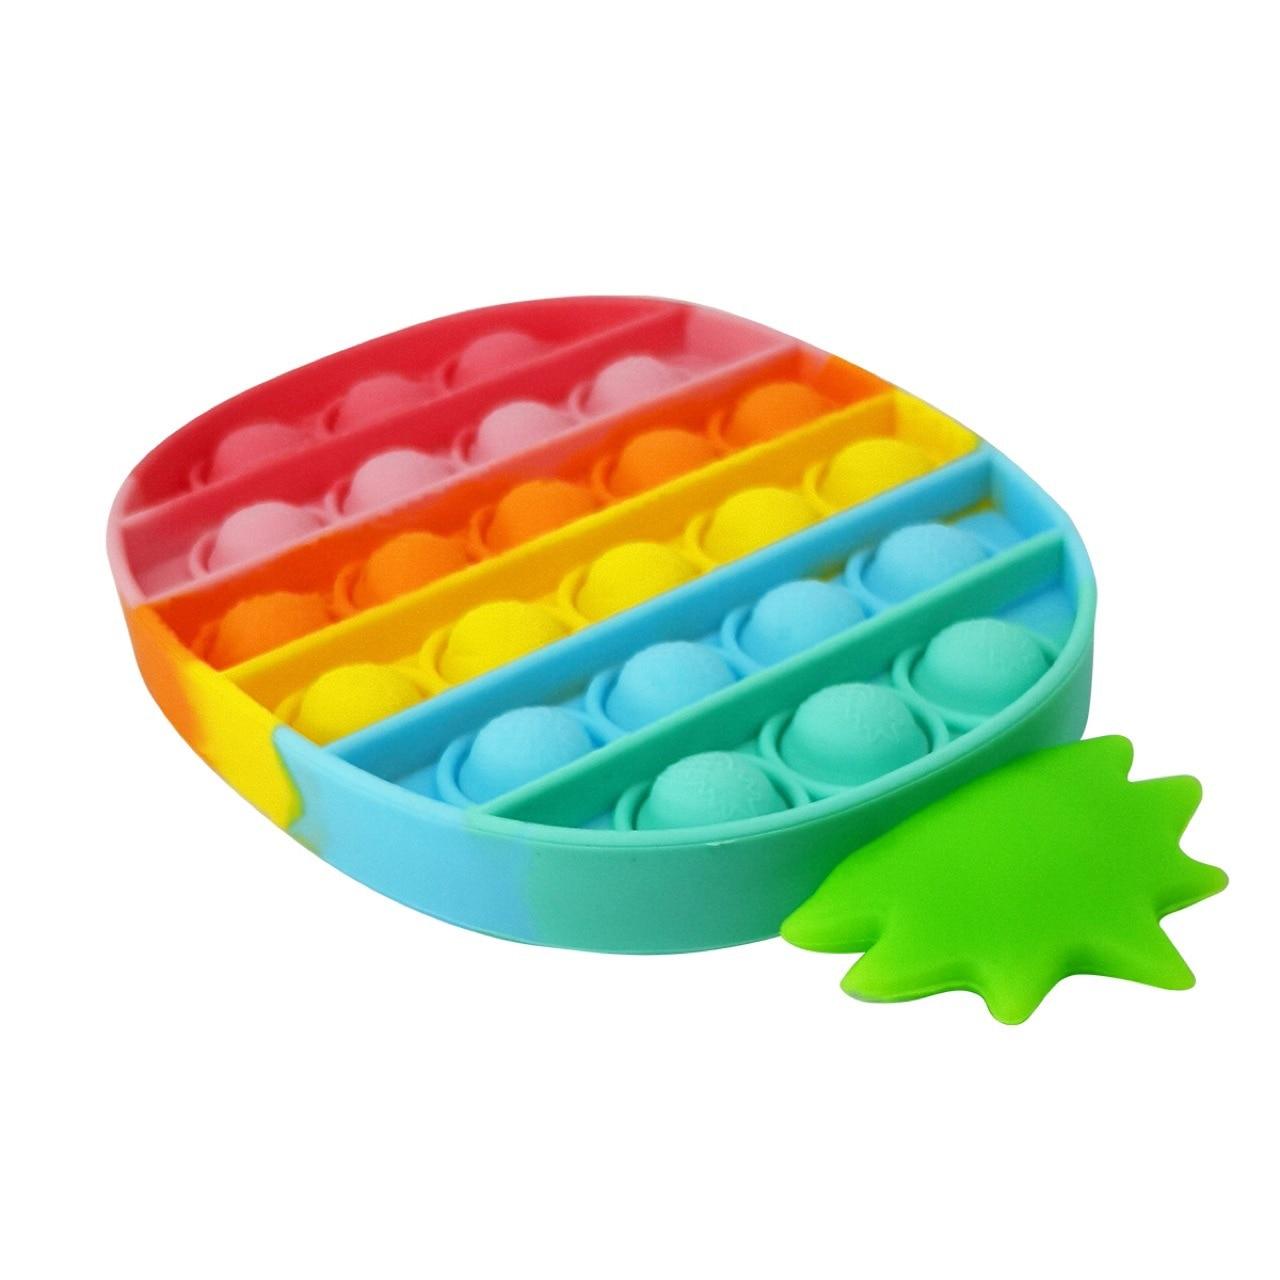 Push Pop Bubble Sensory Toy Autism Needs Squishy Stress Reliever Toys Anti-stress Pop It Fidget Strawberry Pineapple Rainbow Toy img5